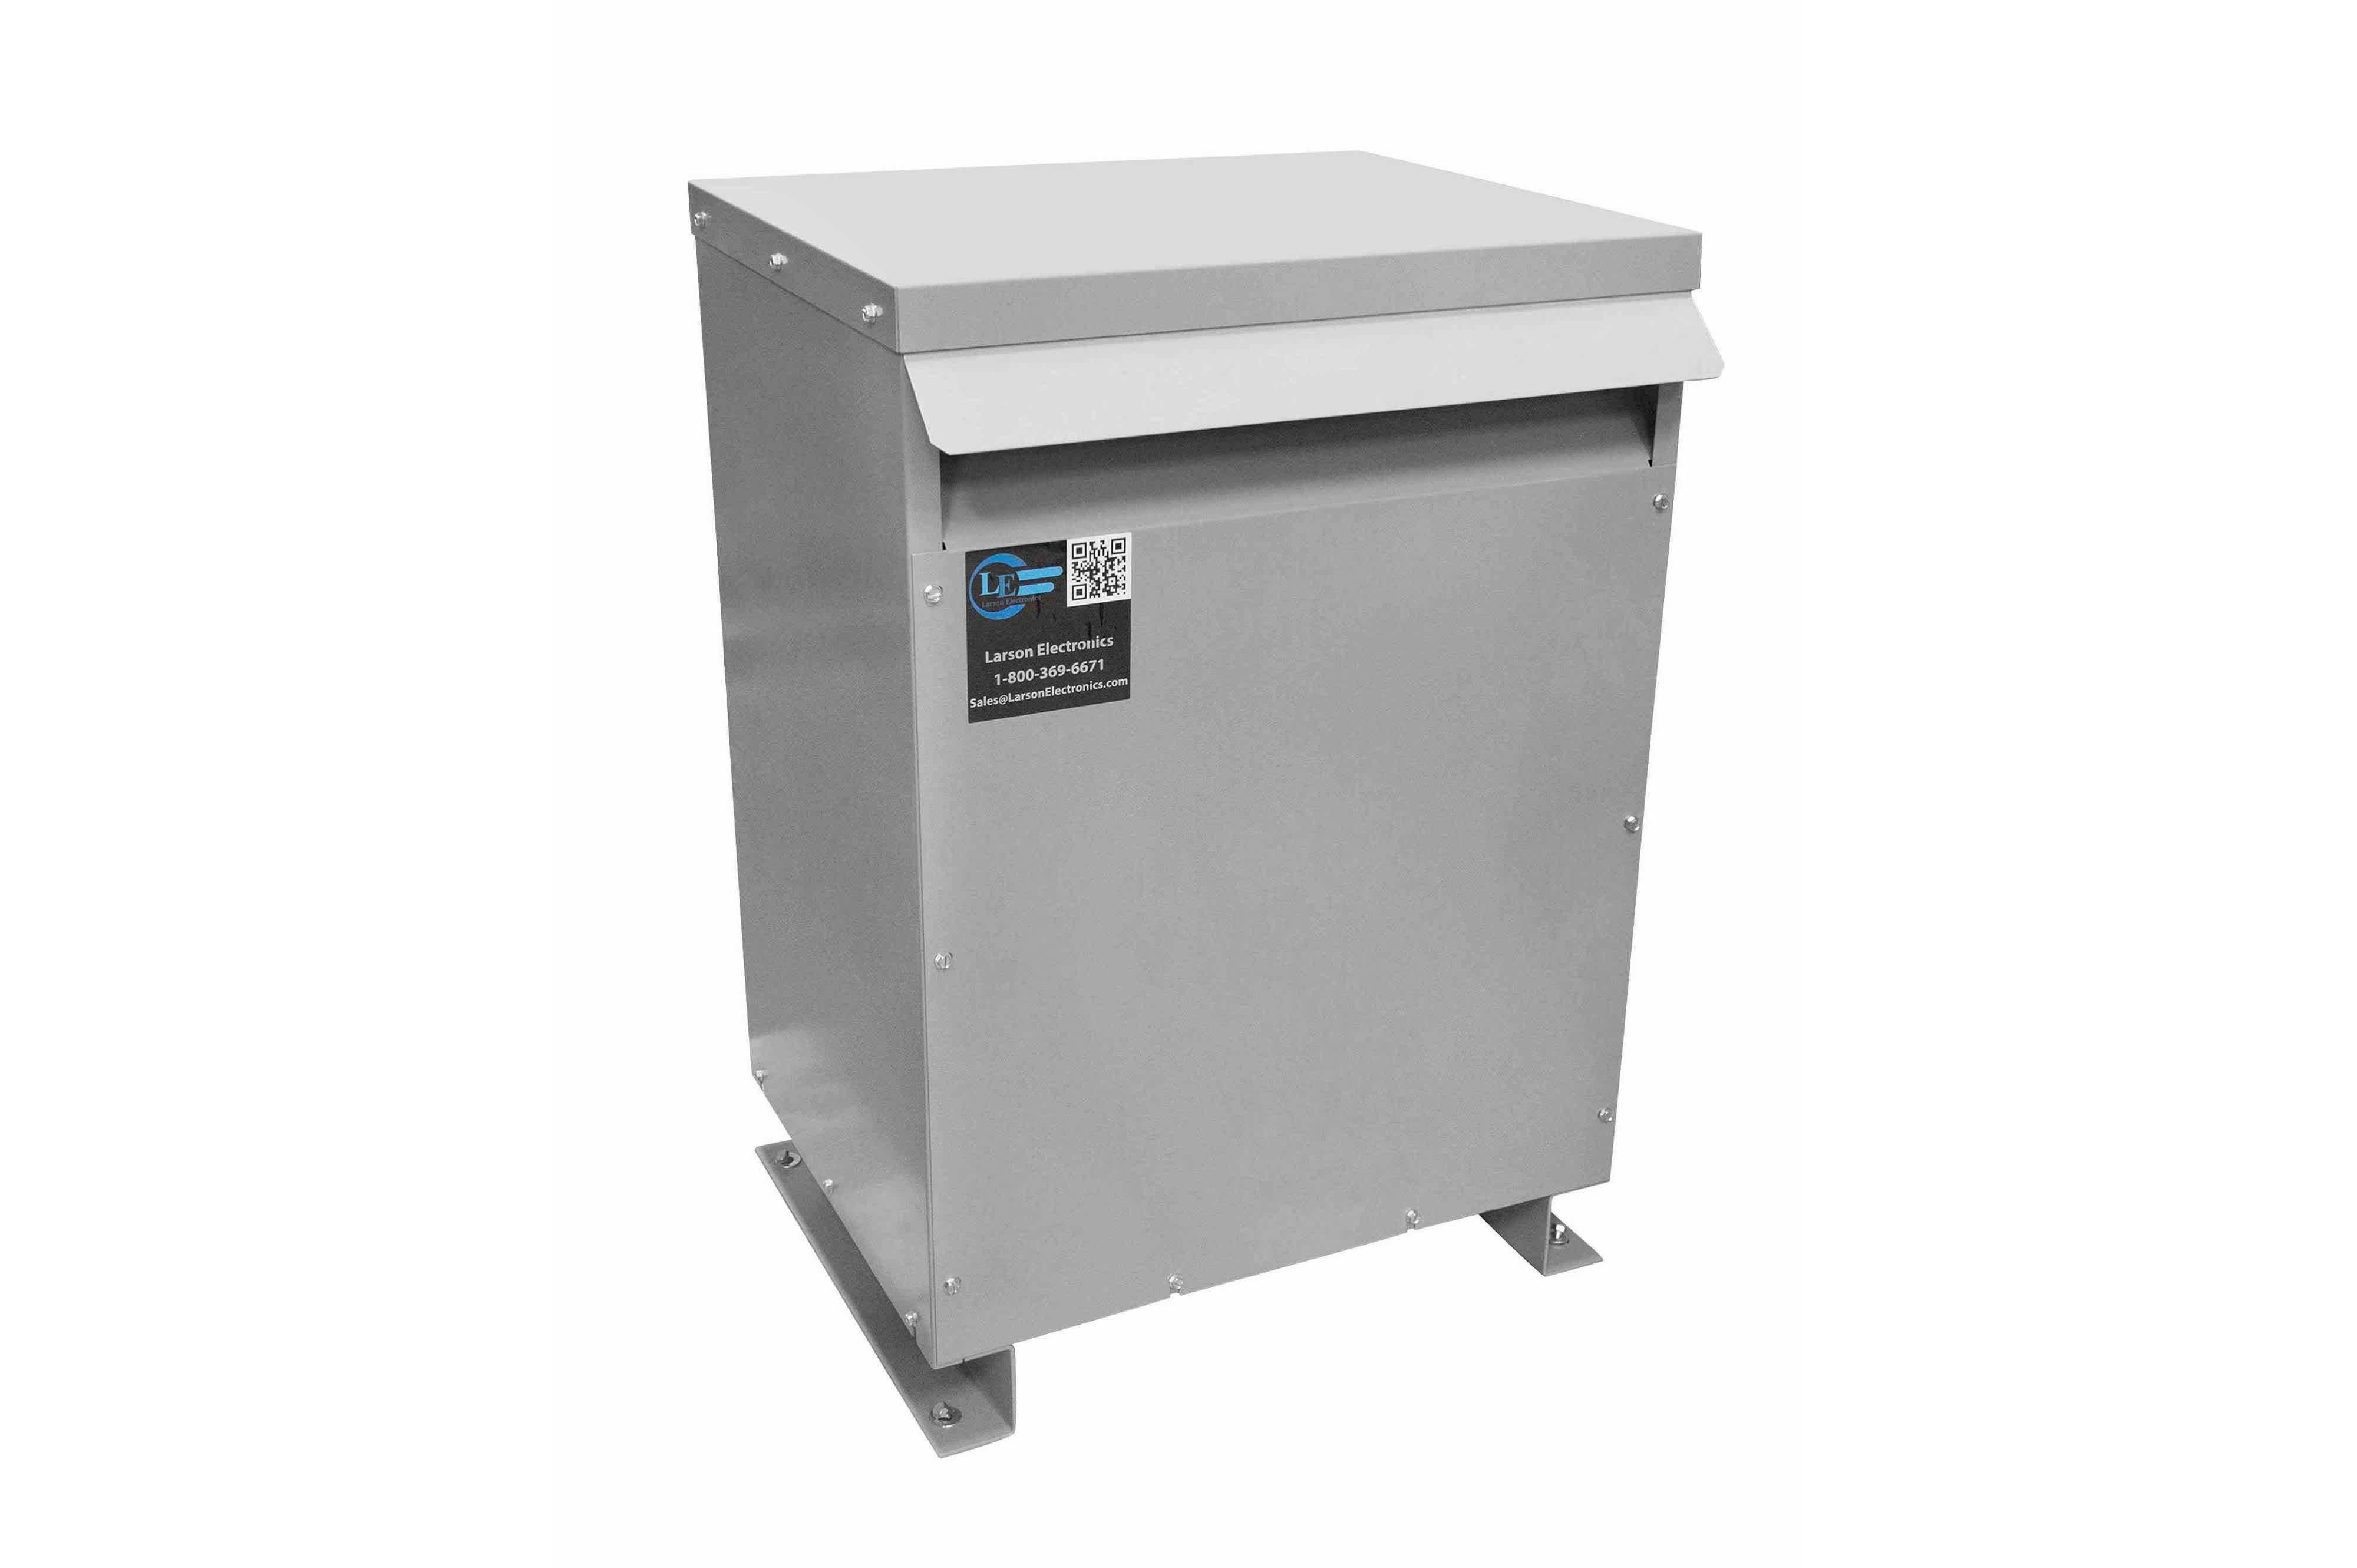 52.5 kVA 3PH Isolation Transformer, 480V Wye Primary, 380V Delta Secondary, N3R, Ventilated, 60 Hz